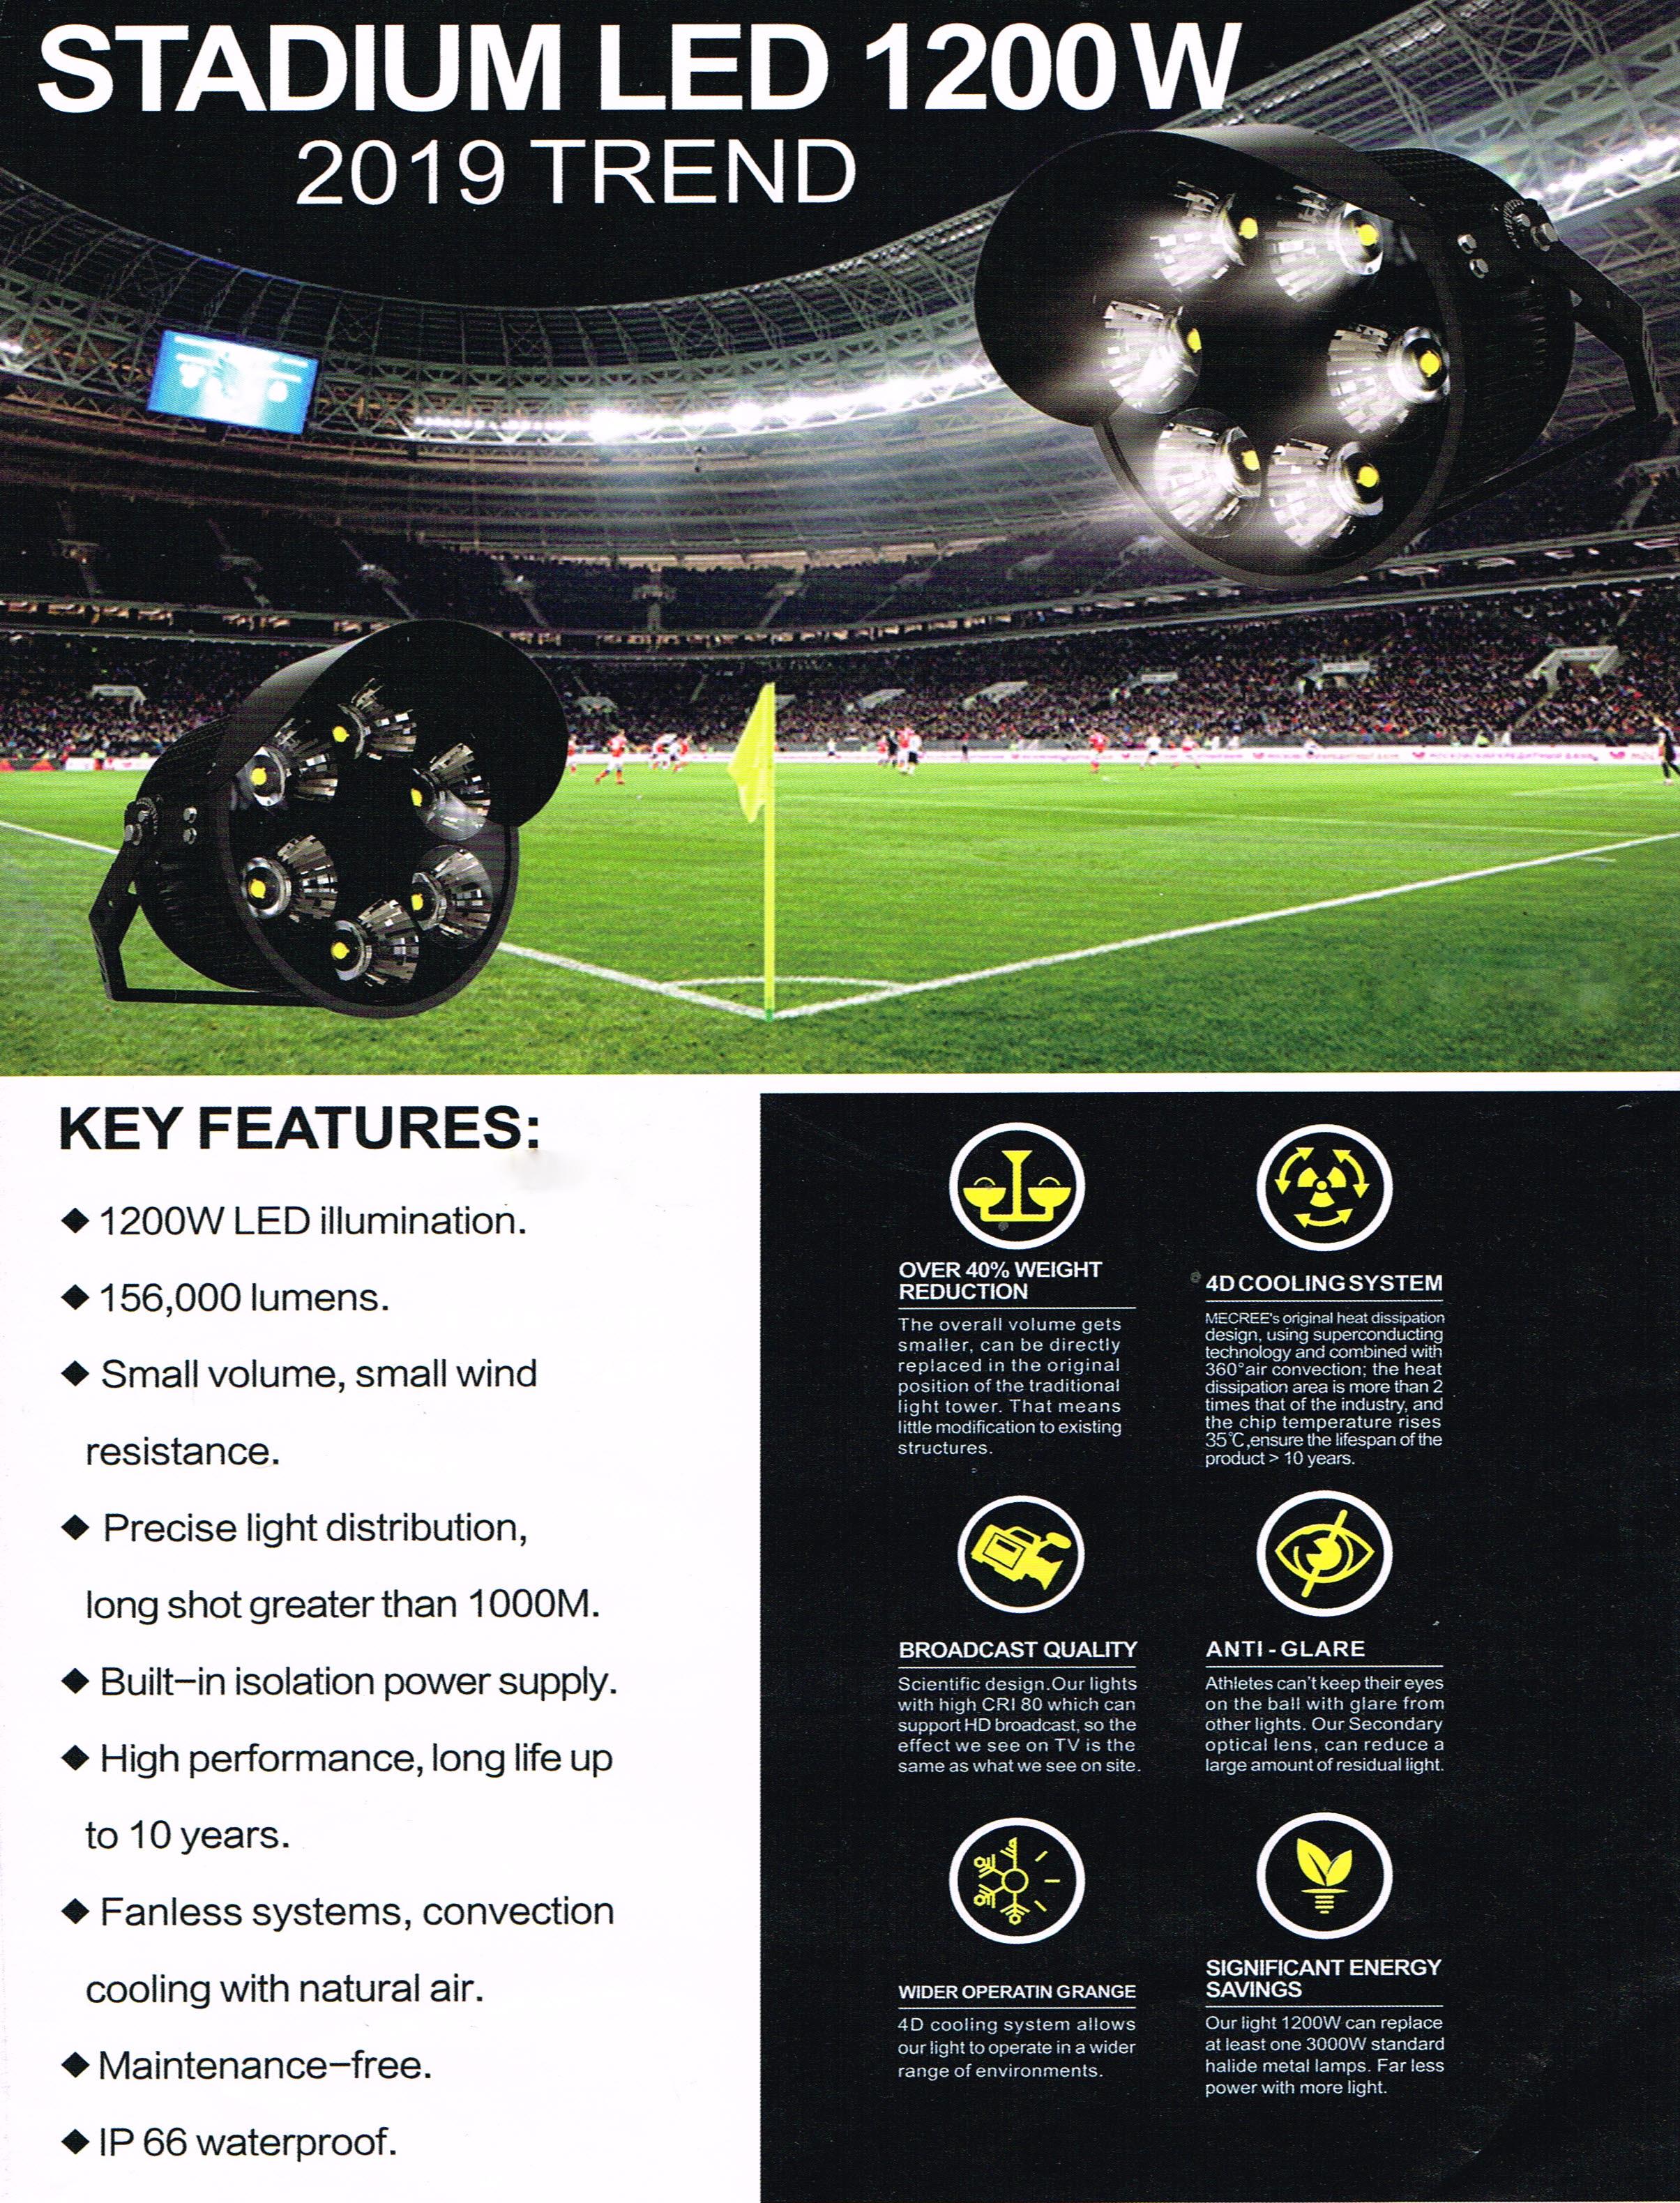 Lampy stadionowe LED 1200 W 156000 lumenów